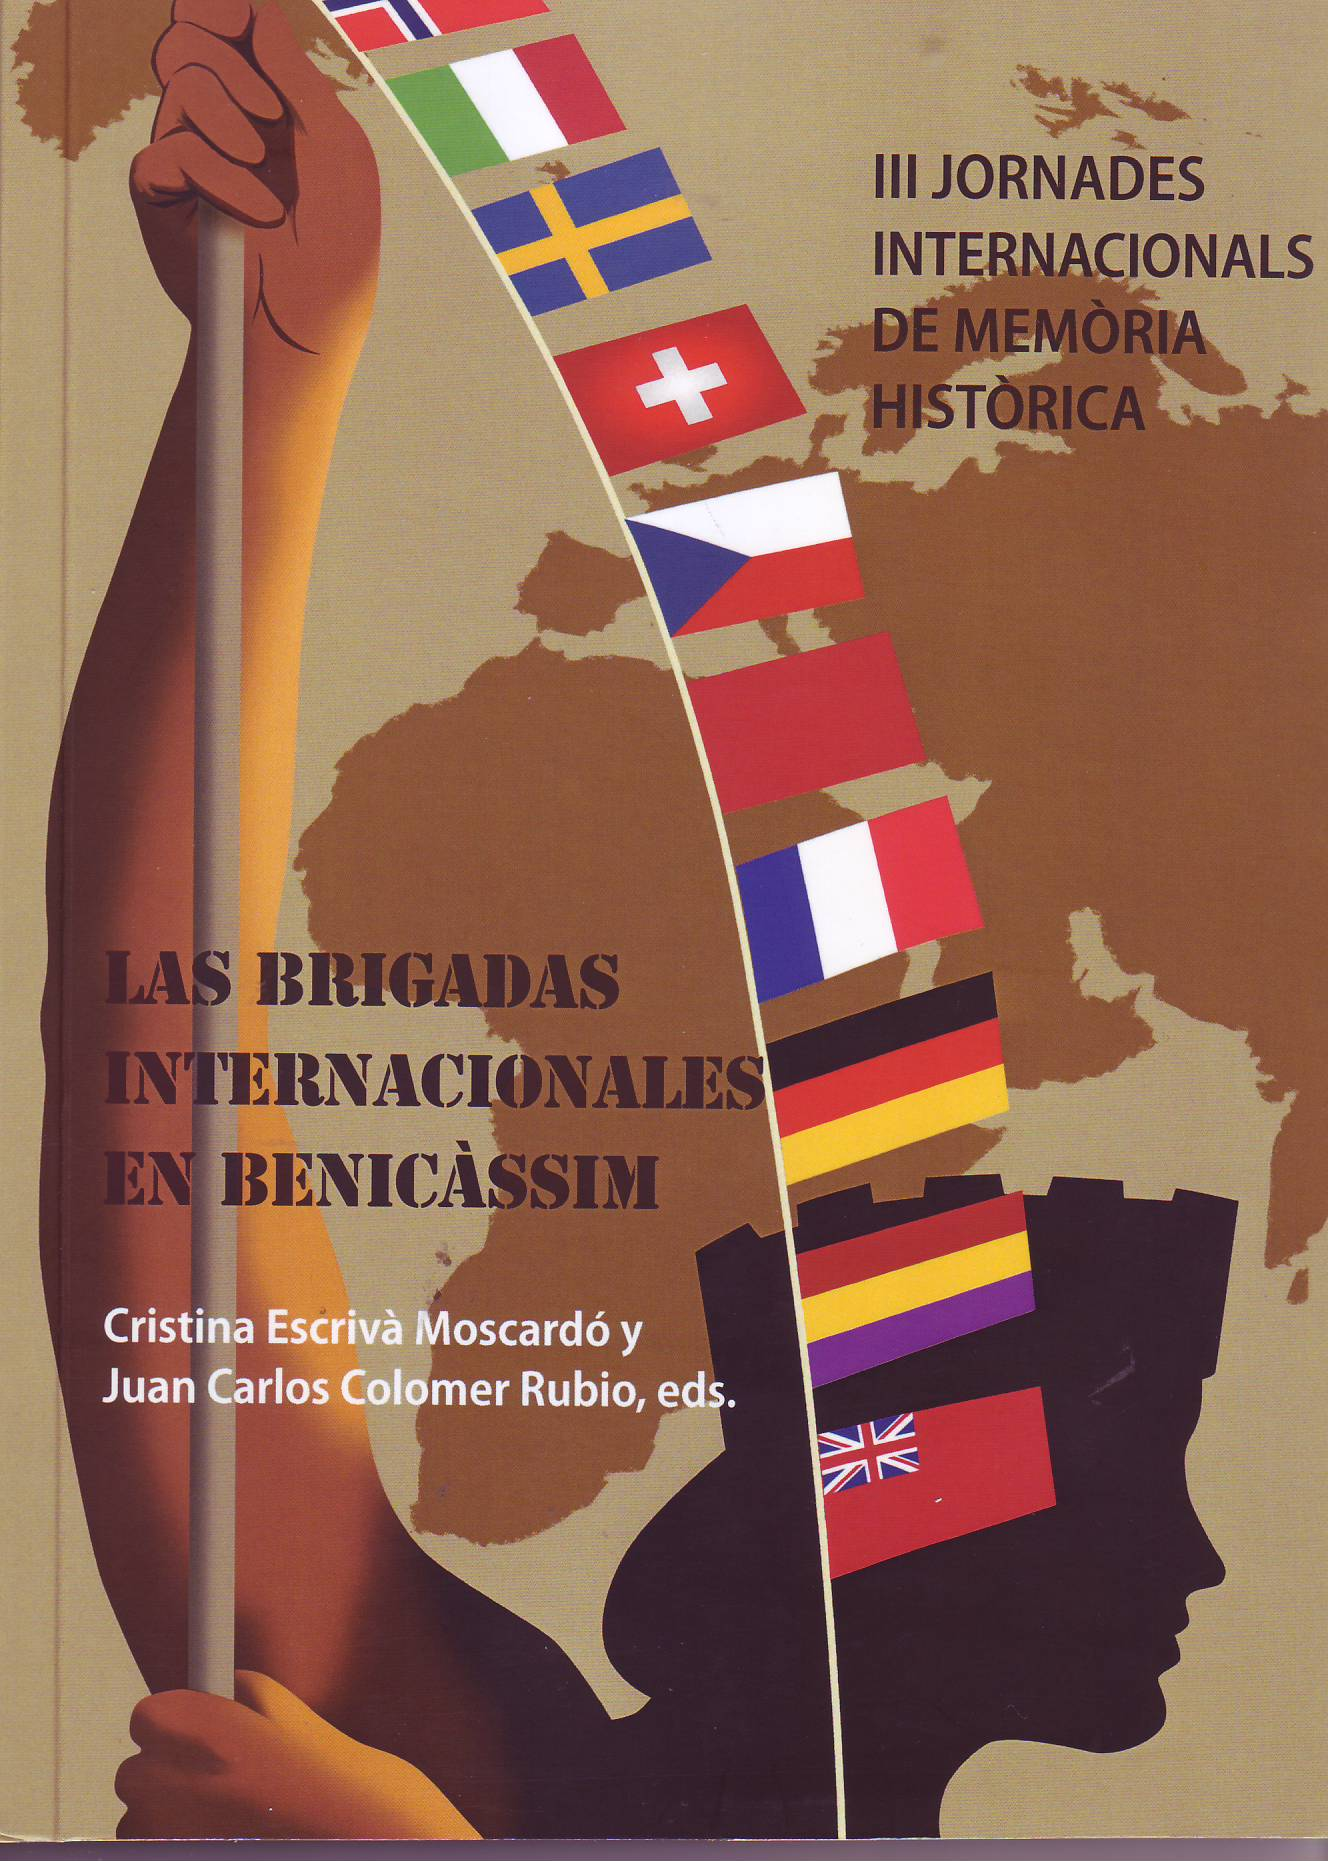 Las Brigadas Internacionales en Benicàssim 1937-1938 : Benicàsim, III Jornades Internacionals de Memòria Històrica 2013.